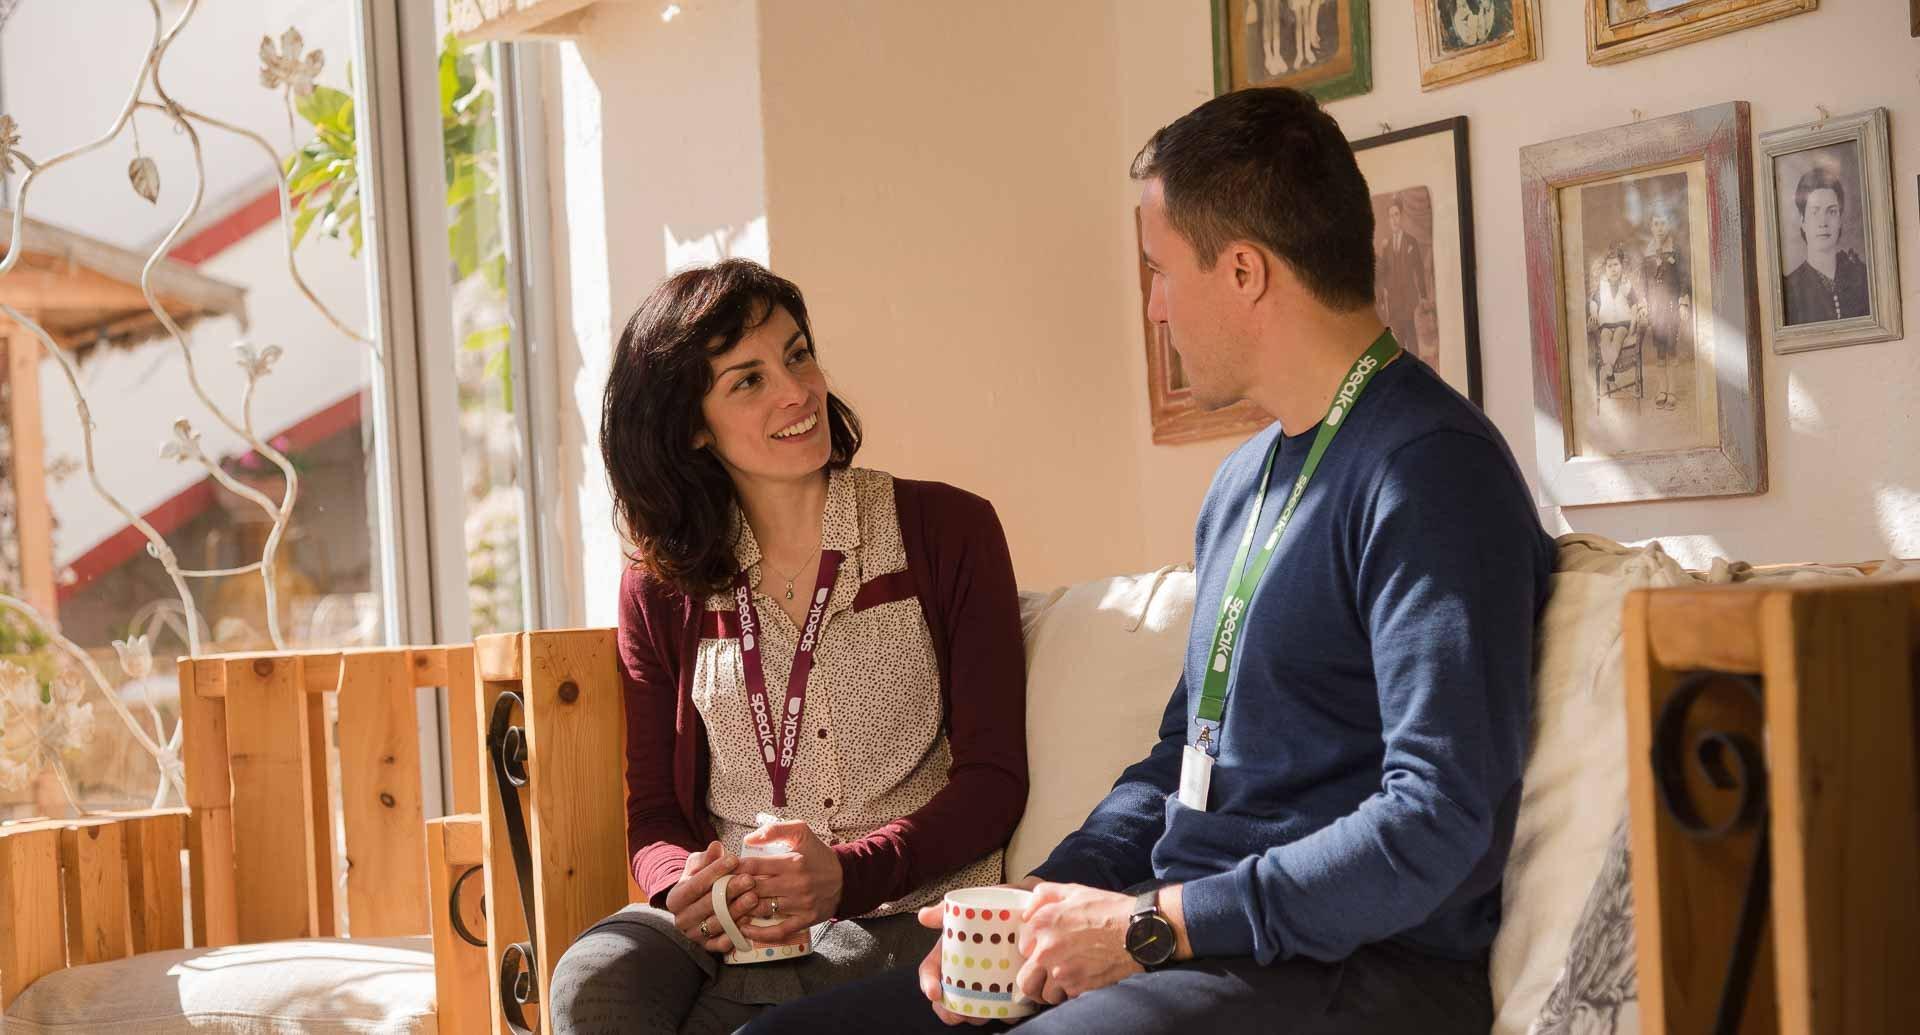 Una conversazione One-to-One durante la full Immersion di Speak